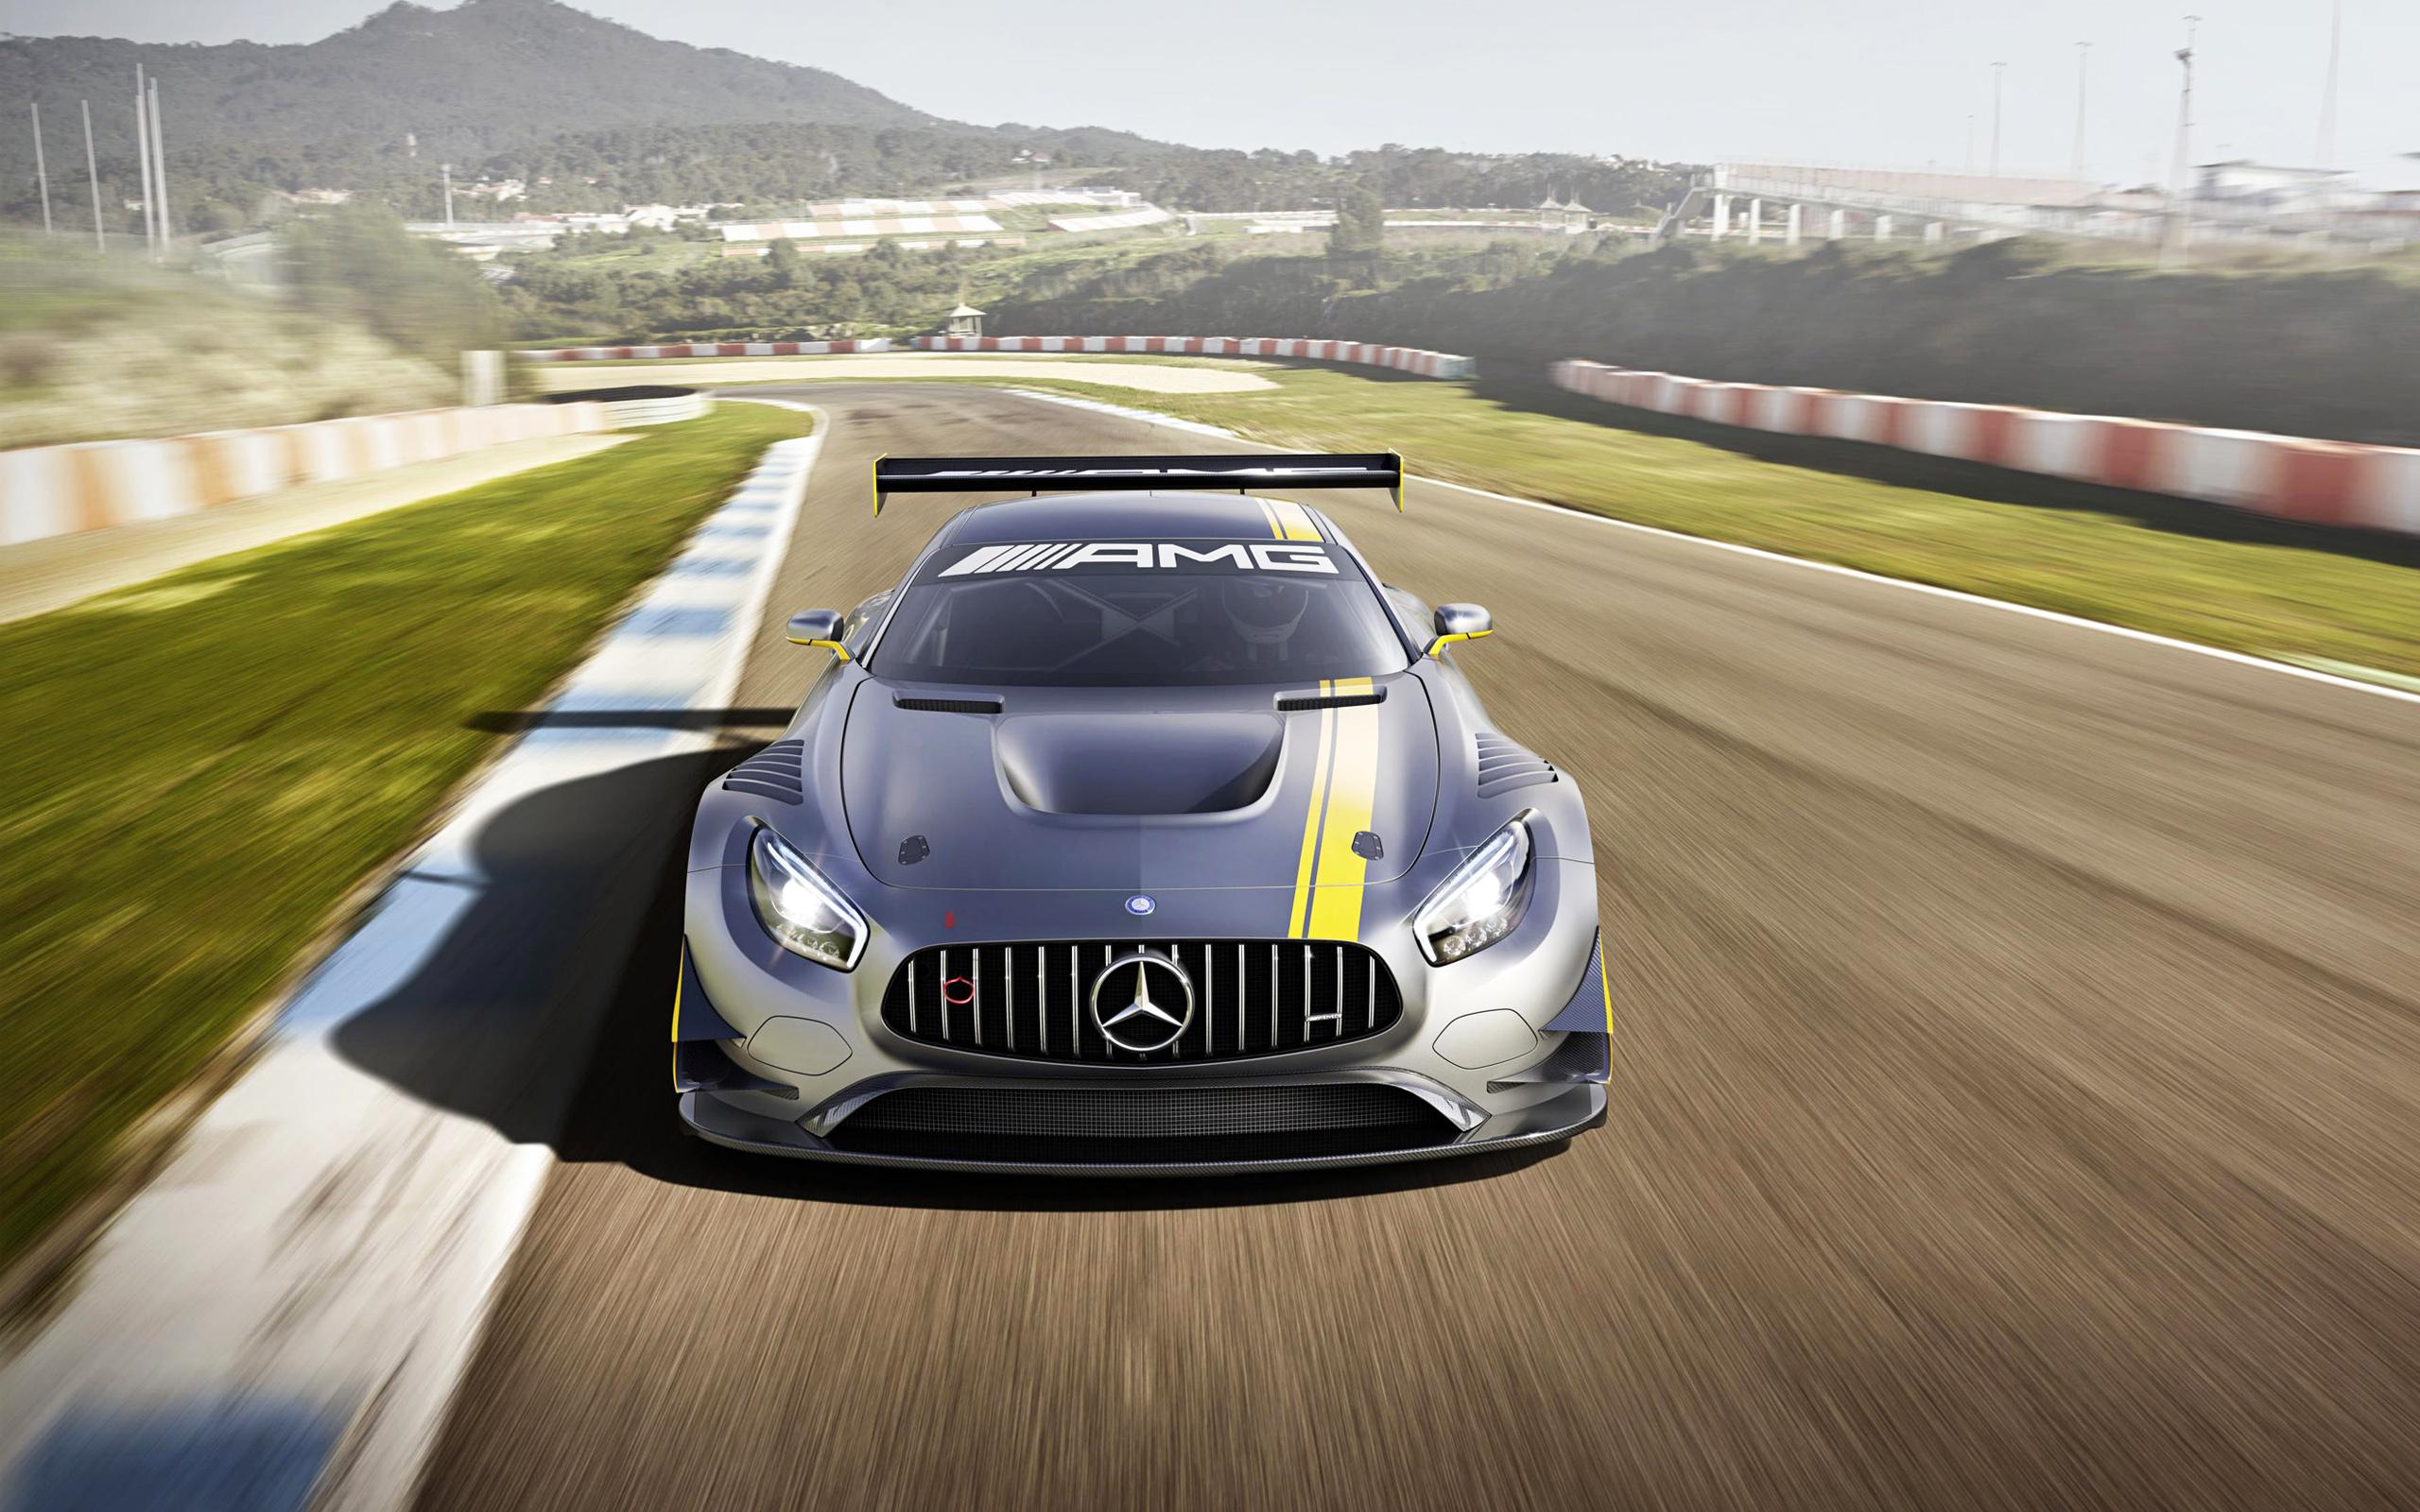 HD Wallpapers 2015 Mercedes Benz AMG GT3